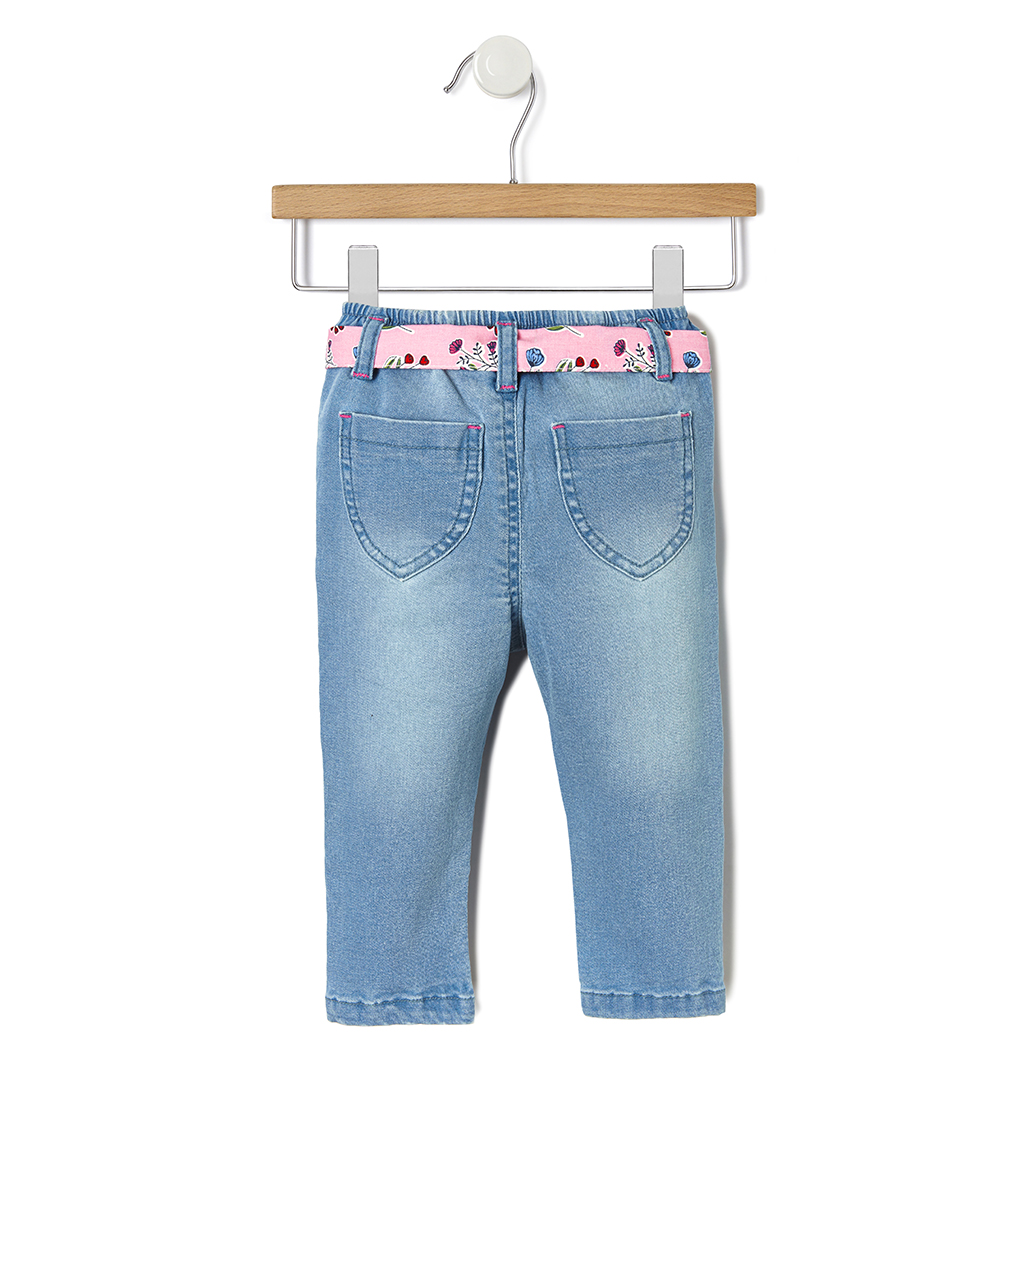 Pantalone denim con ricami floreali - Prénatal